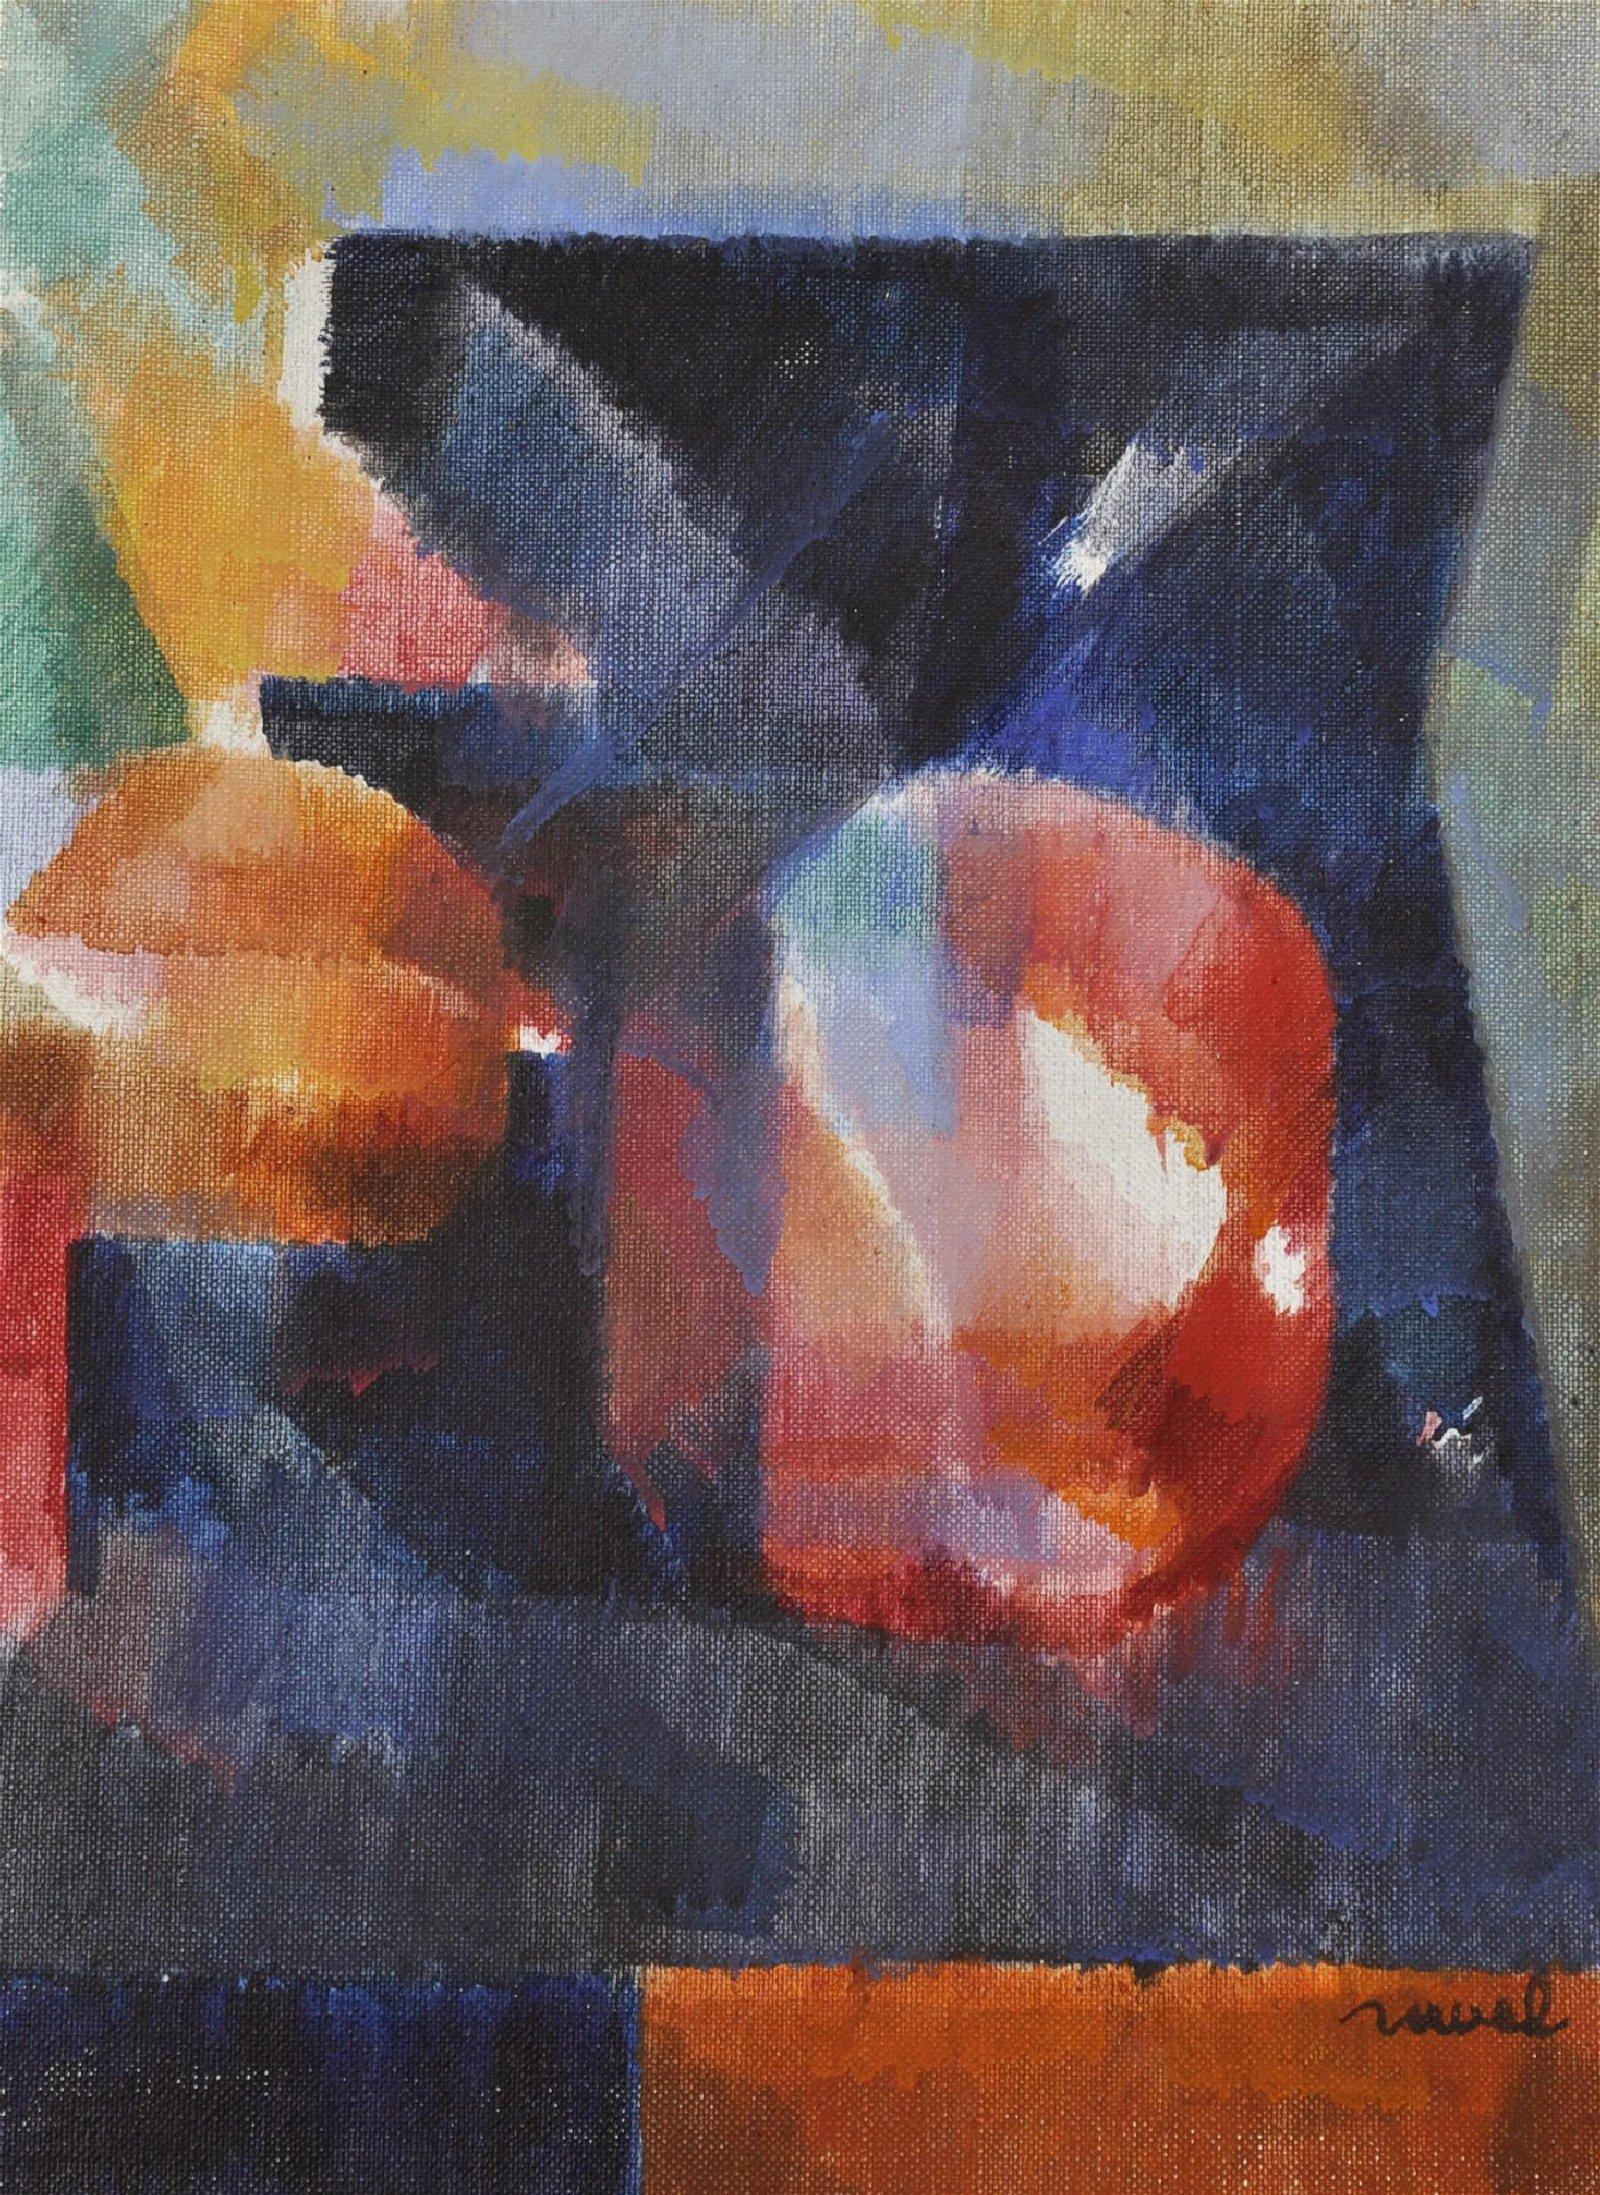 Daniel Ravel (1915-2002) Belgian/American. Abstract